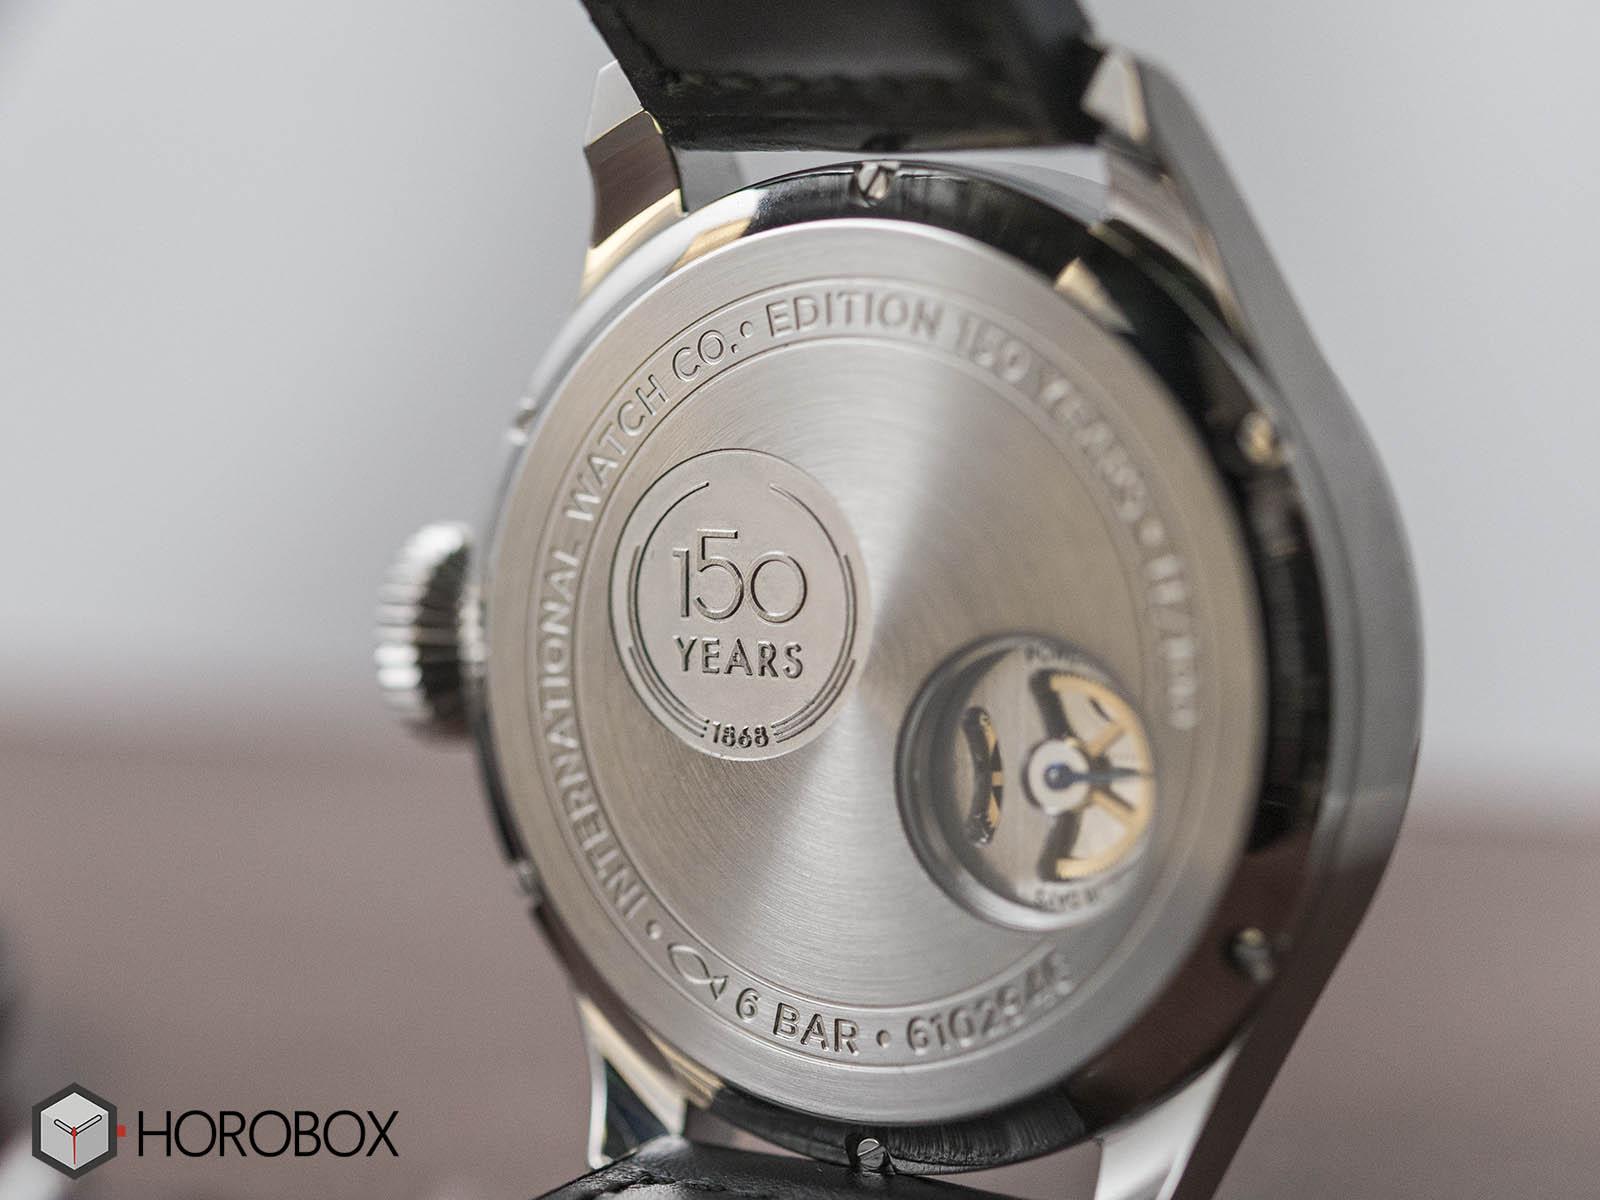 iw510504-iwc-Big-Pilot-s-Watch-Big-Date-Edition-150-Years-Sihh2018-5.jpg